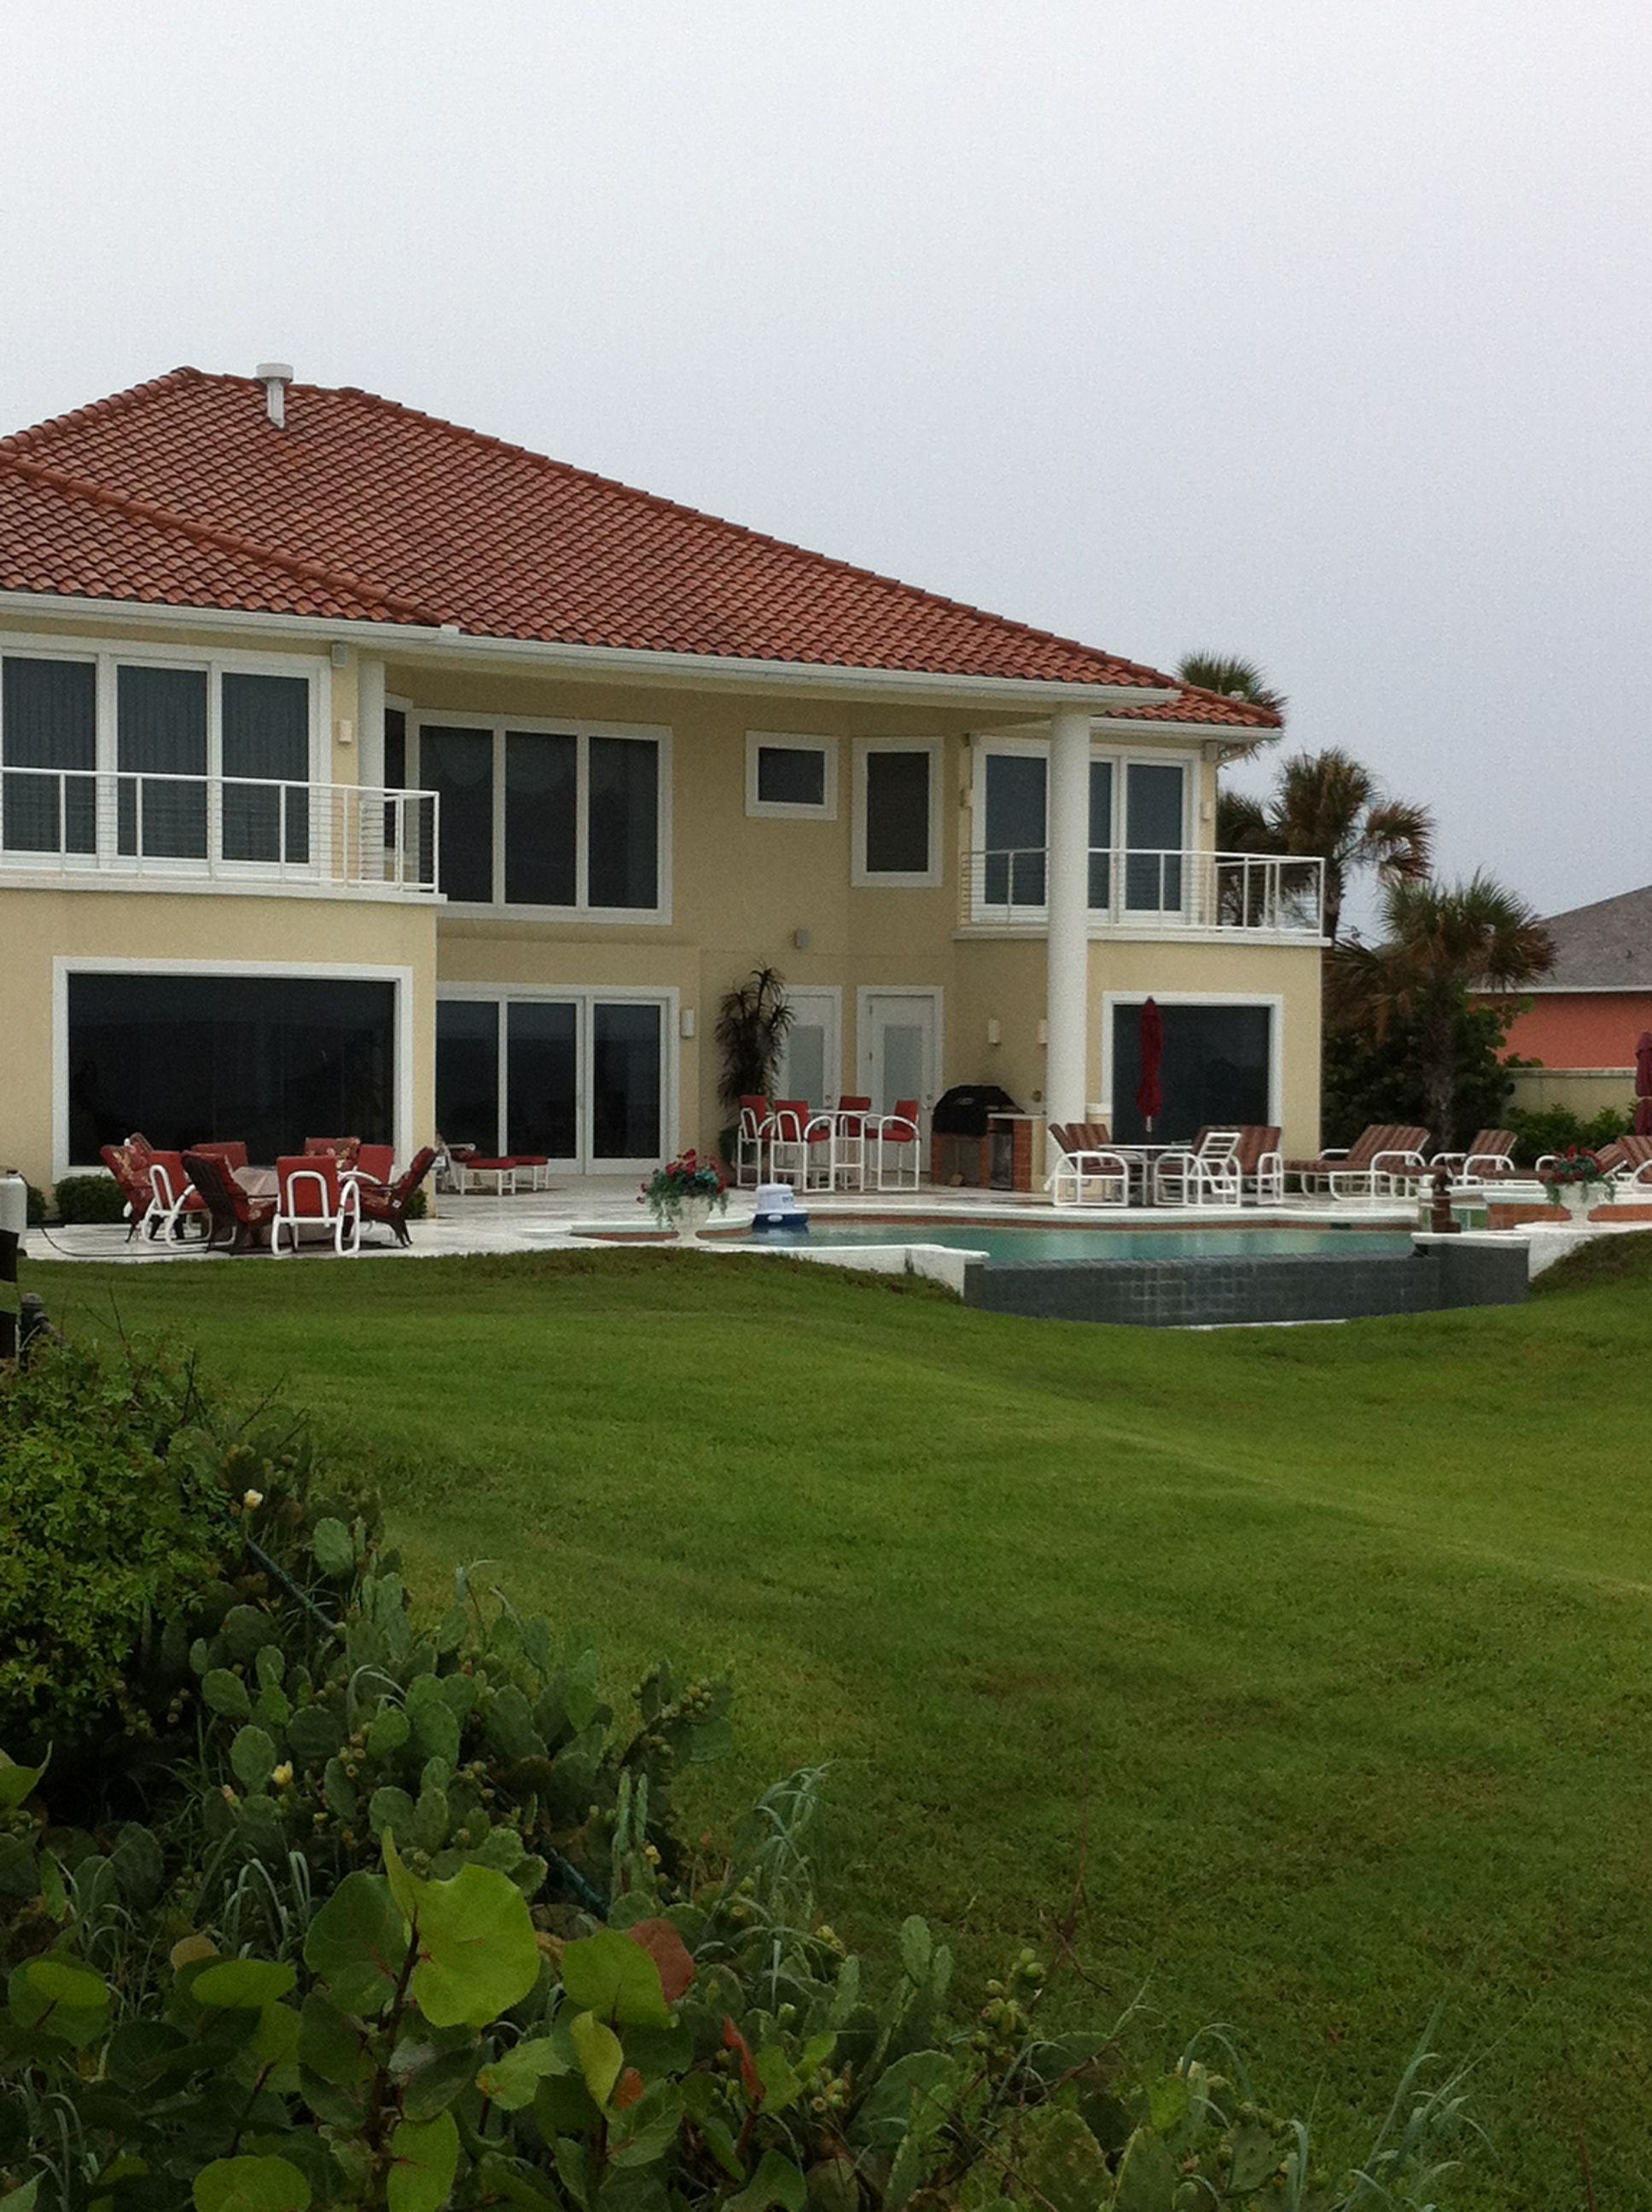 Big House On Daytona Beach Huge Houses Dream House Big Houses